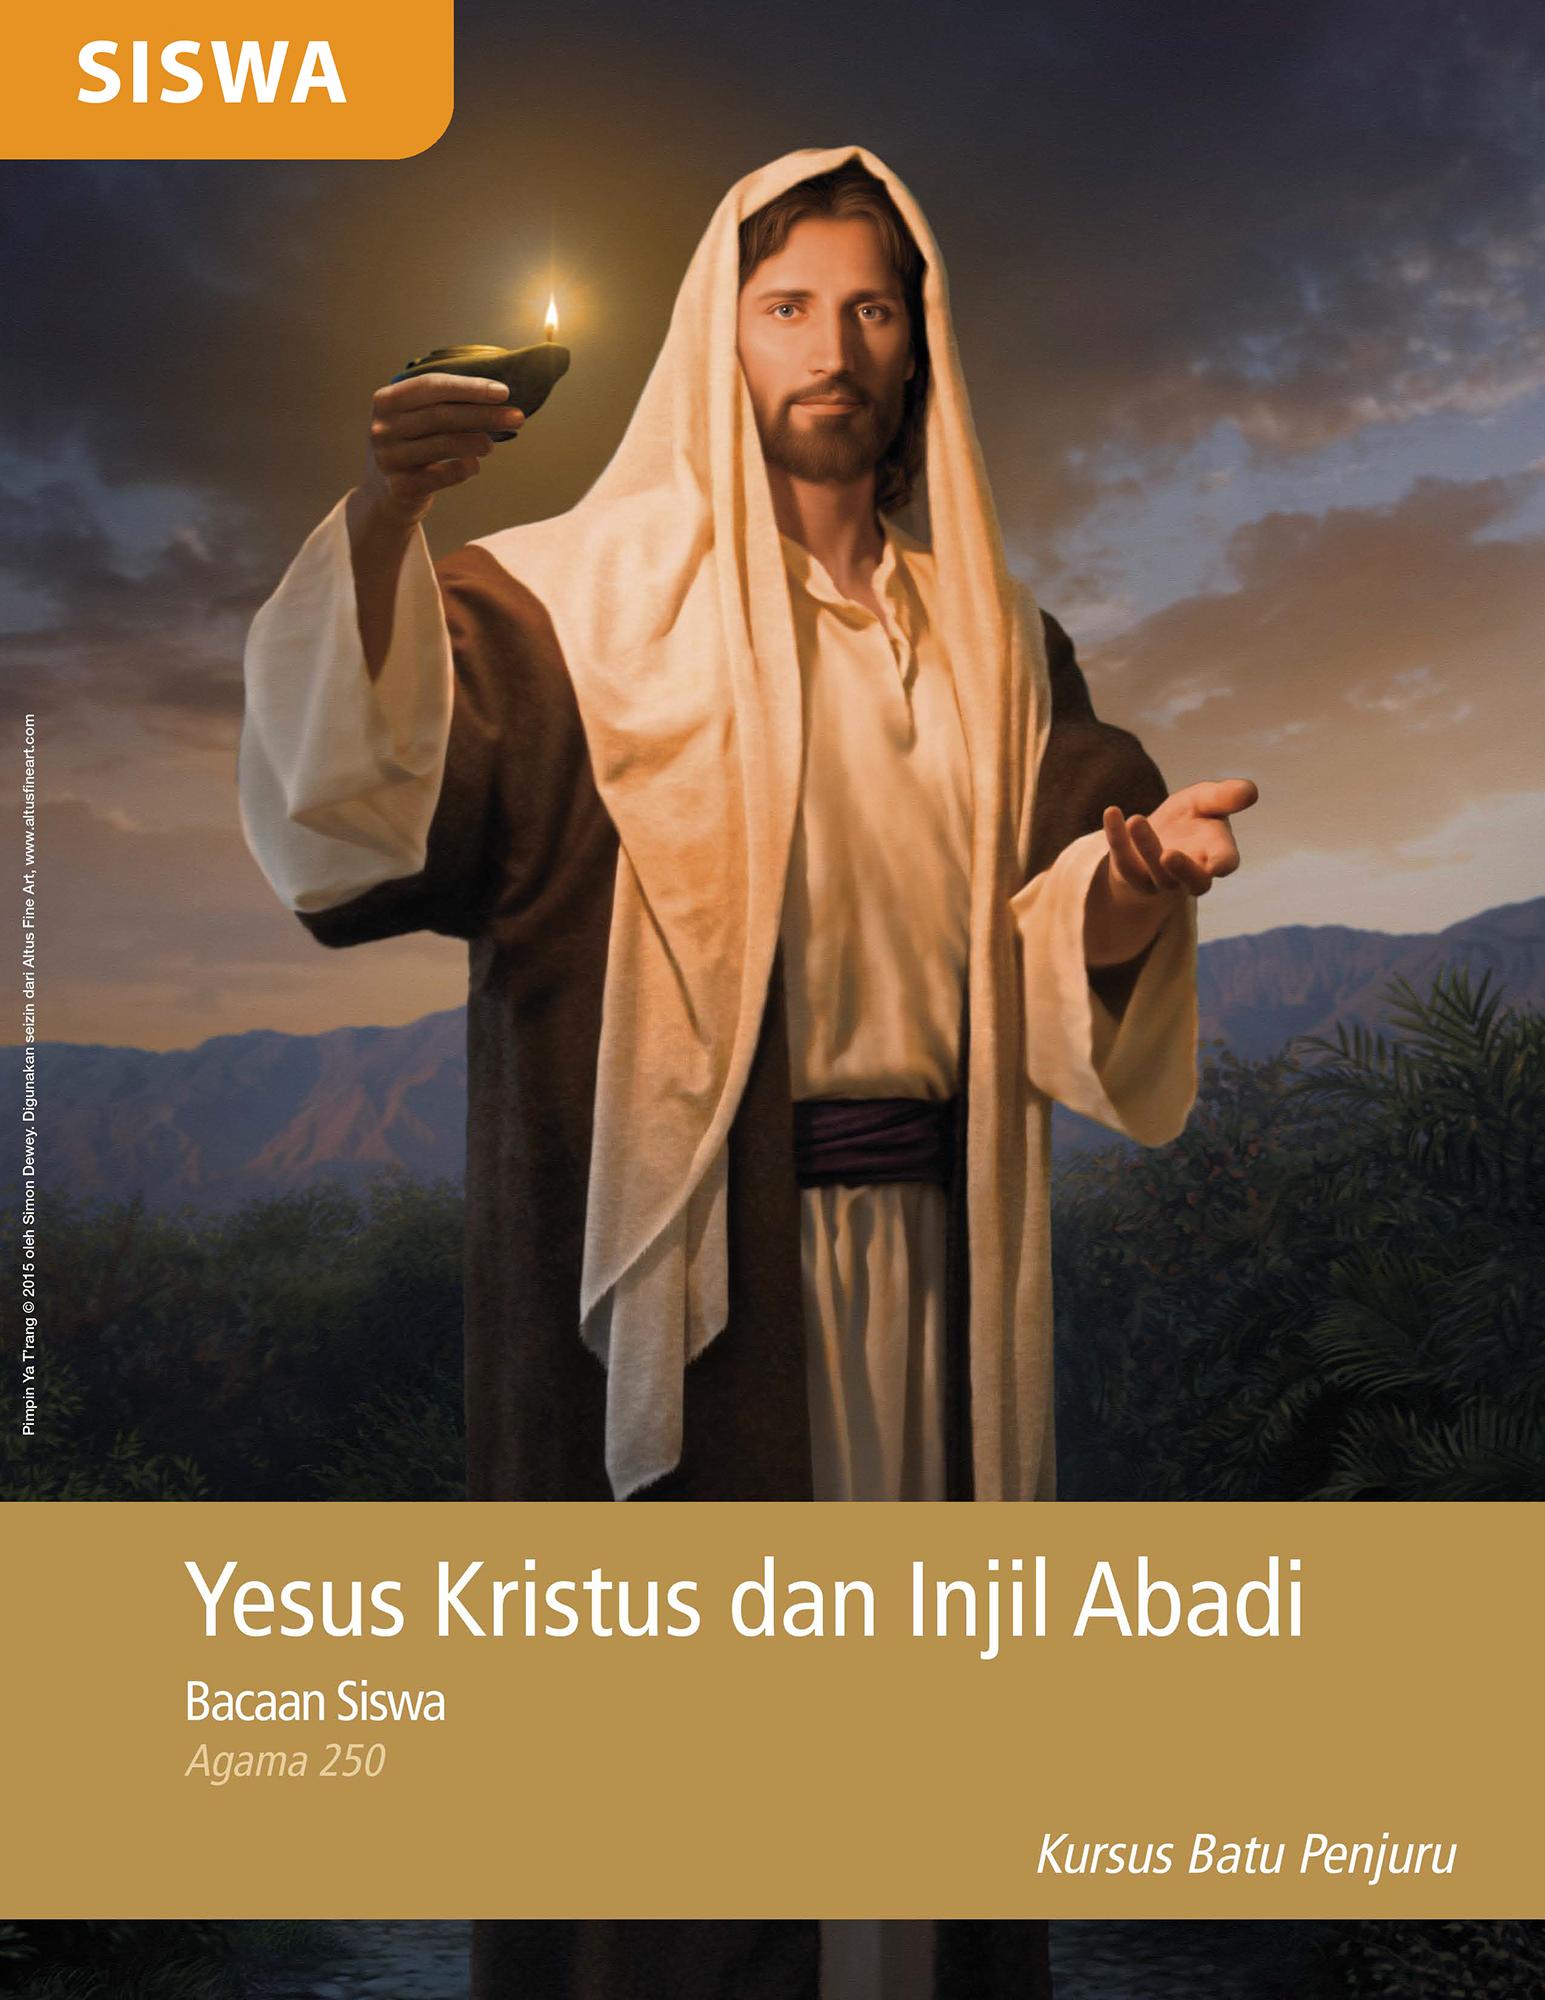 Bacaan Siswa Yesus Kristus dan Injil Abadi (Religi 250)